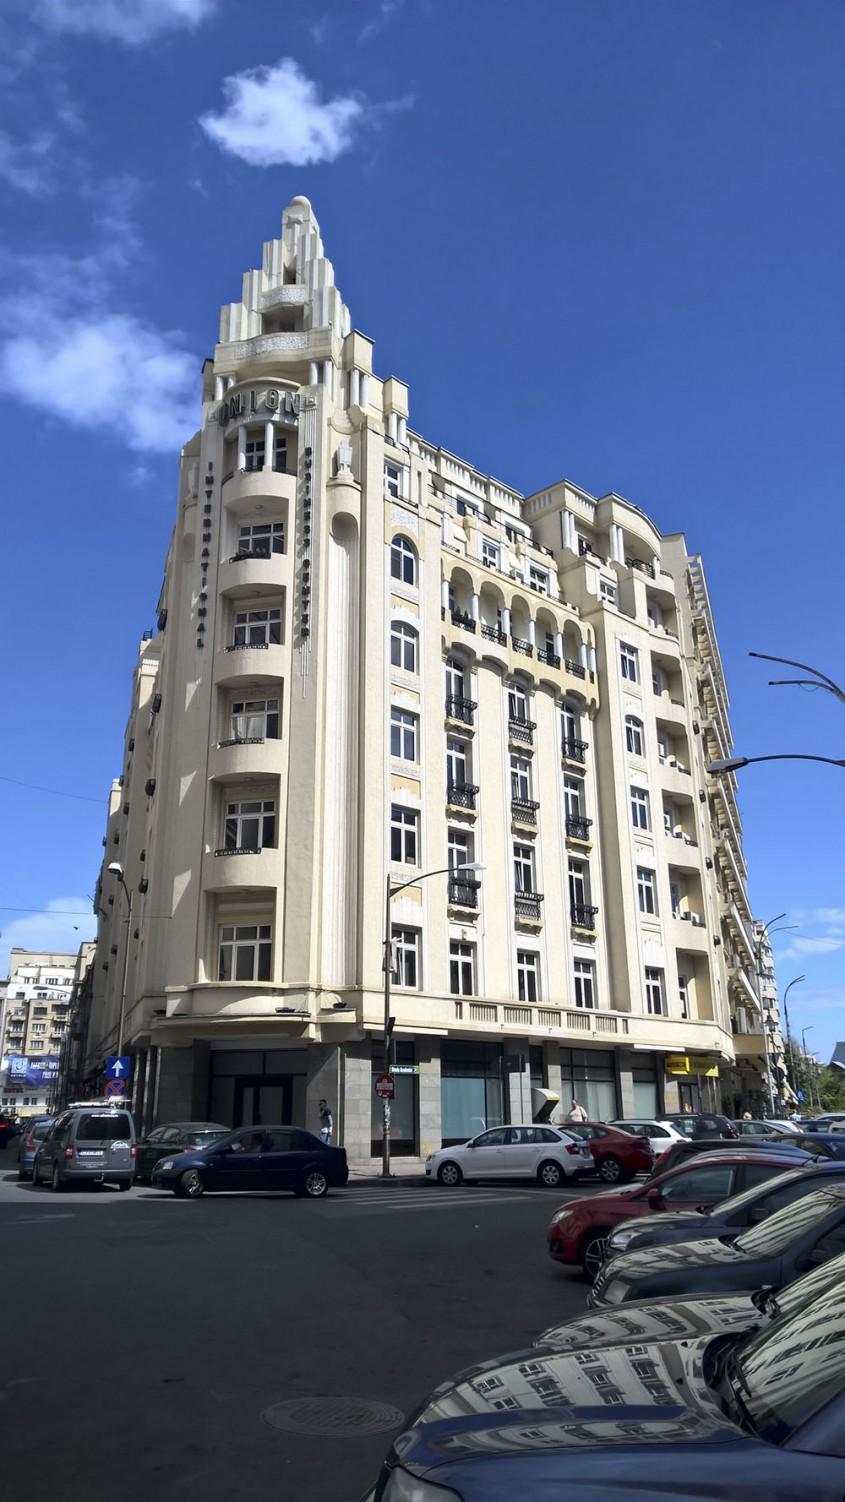 B MAD 2 0 Art Deco & Bulevardele Centrale a lansat primul traseu virtual Art Deco